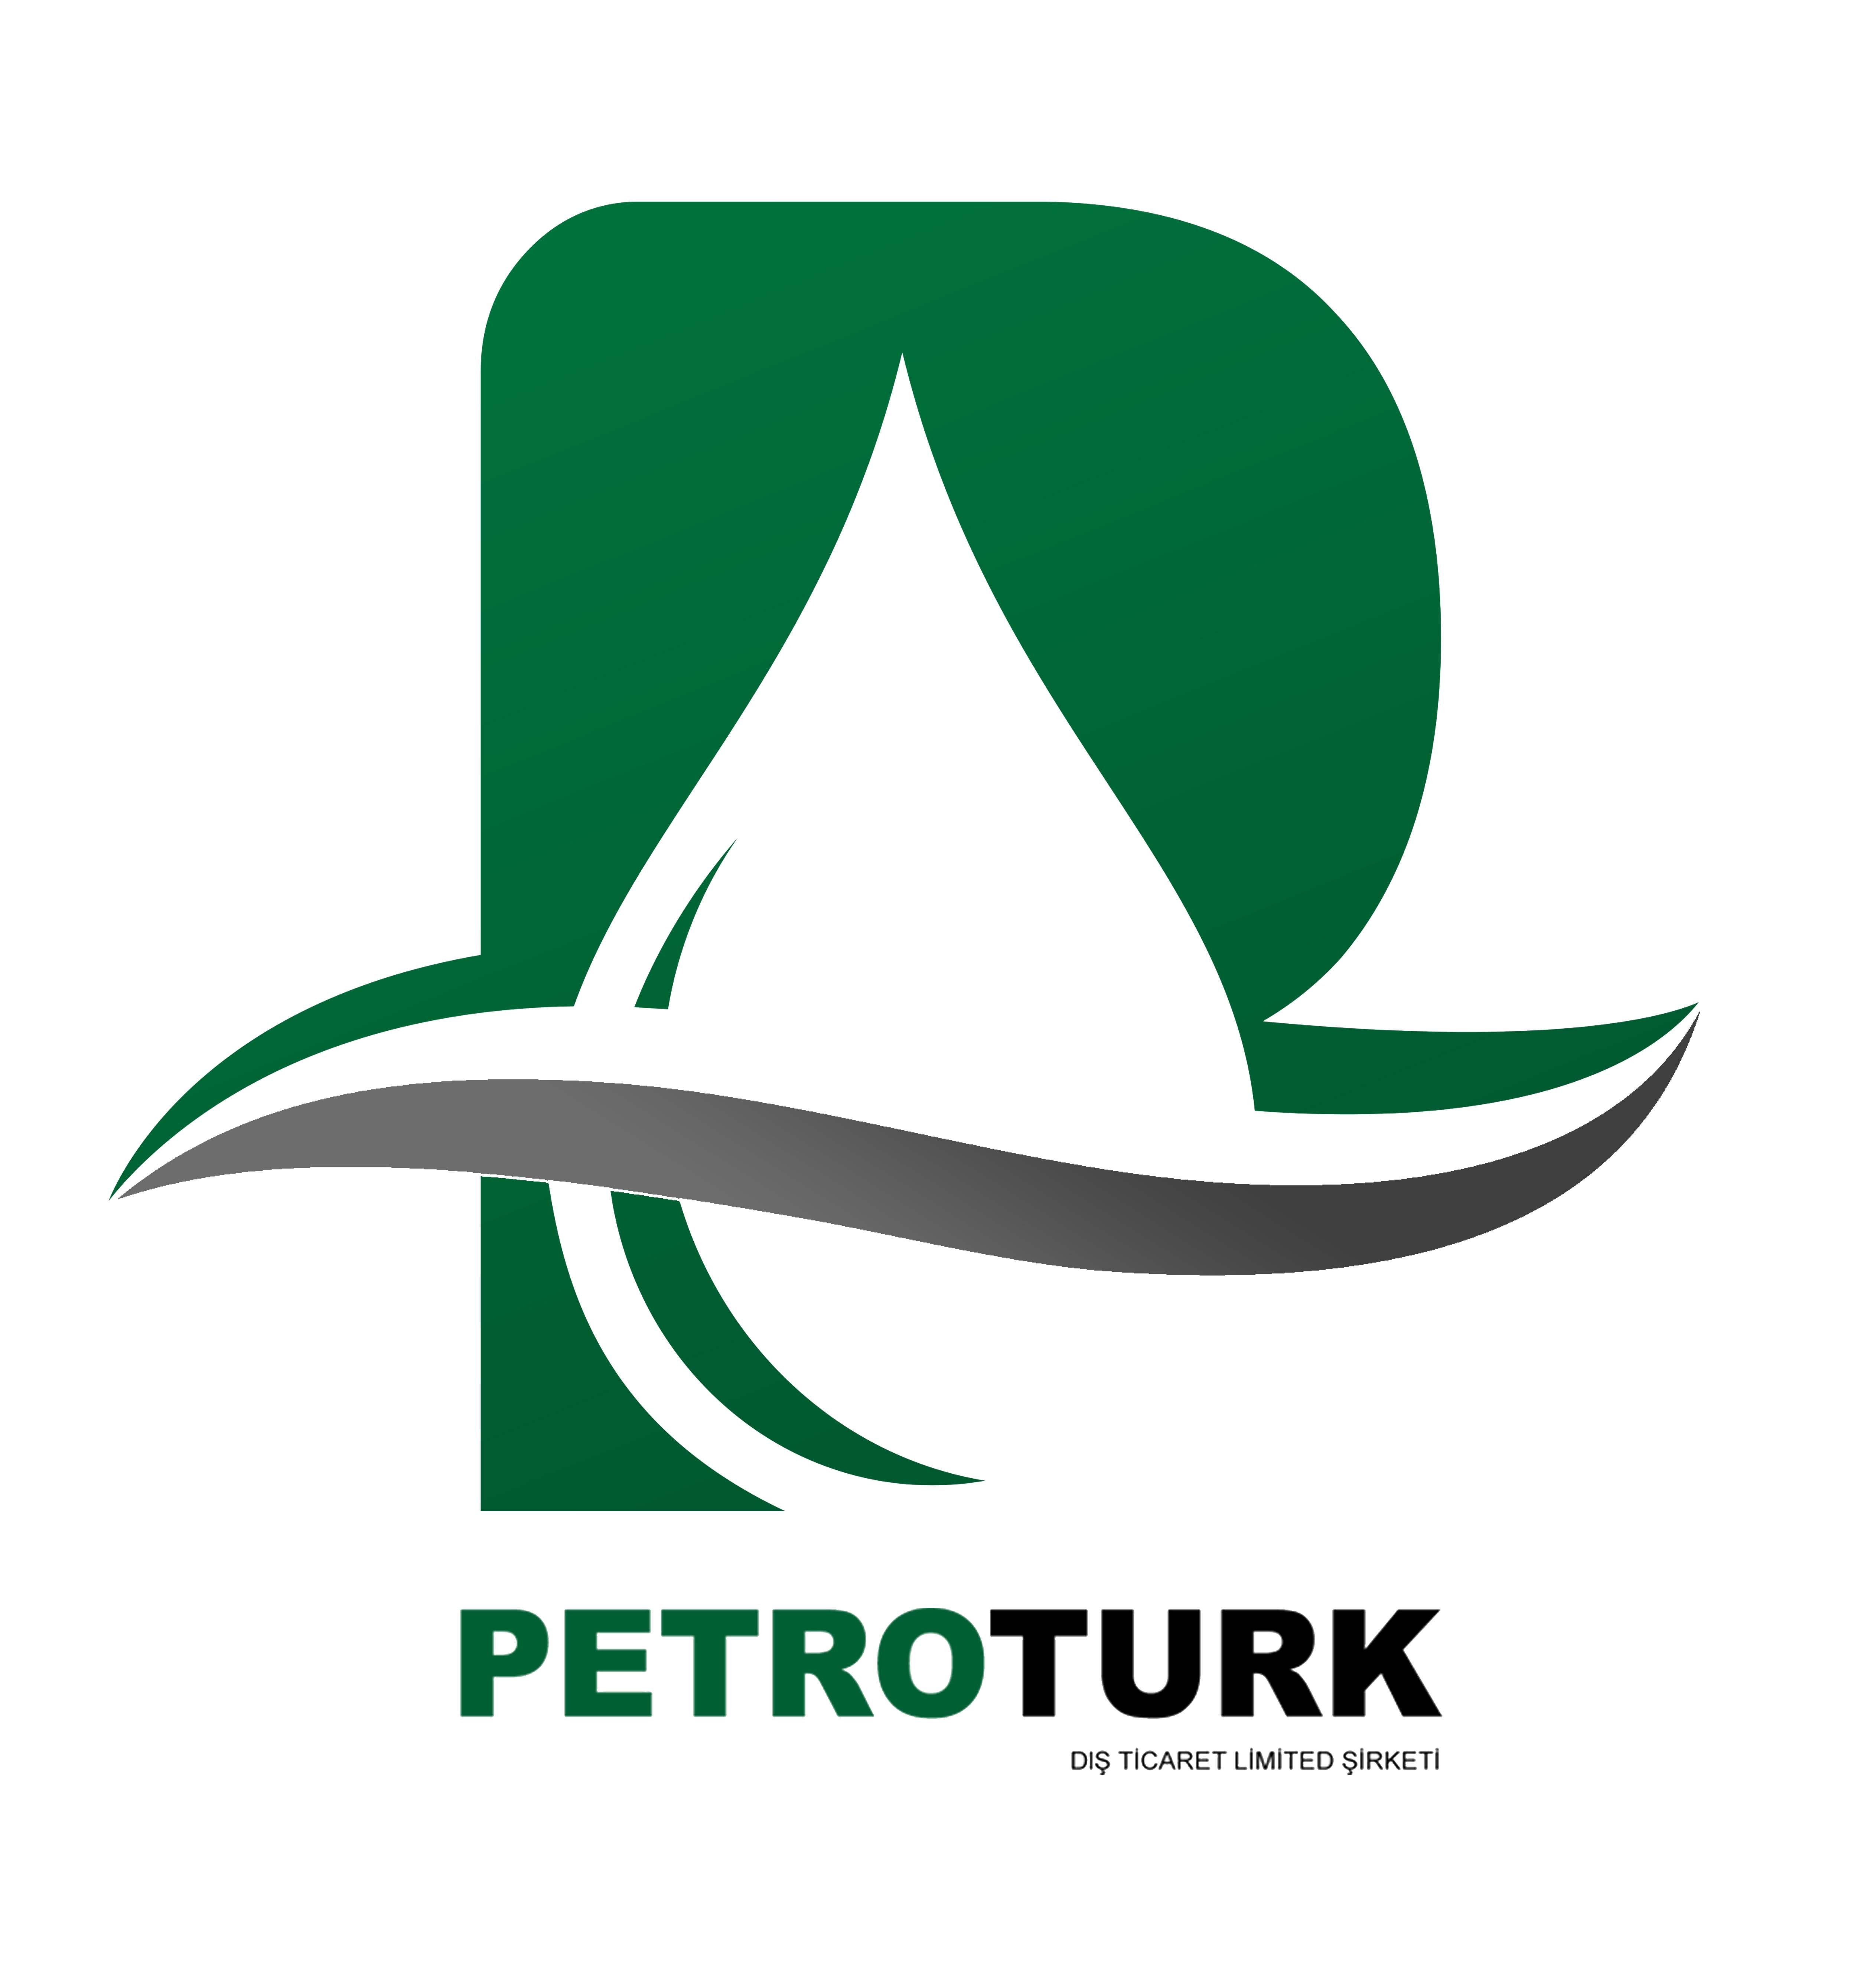 PETROTURK DIS TICARET LIMITED SIRKETI